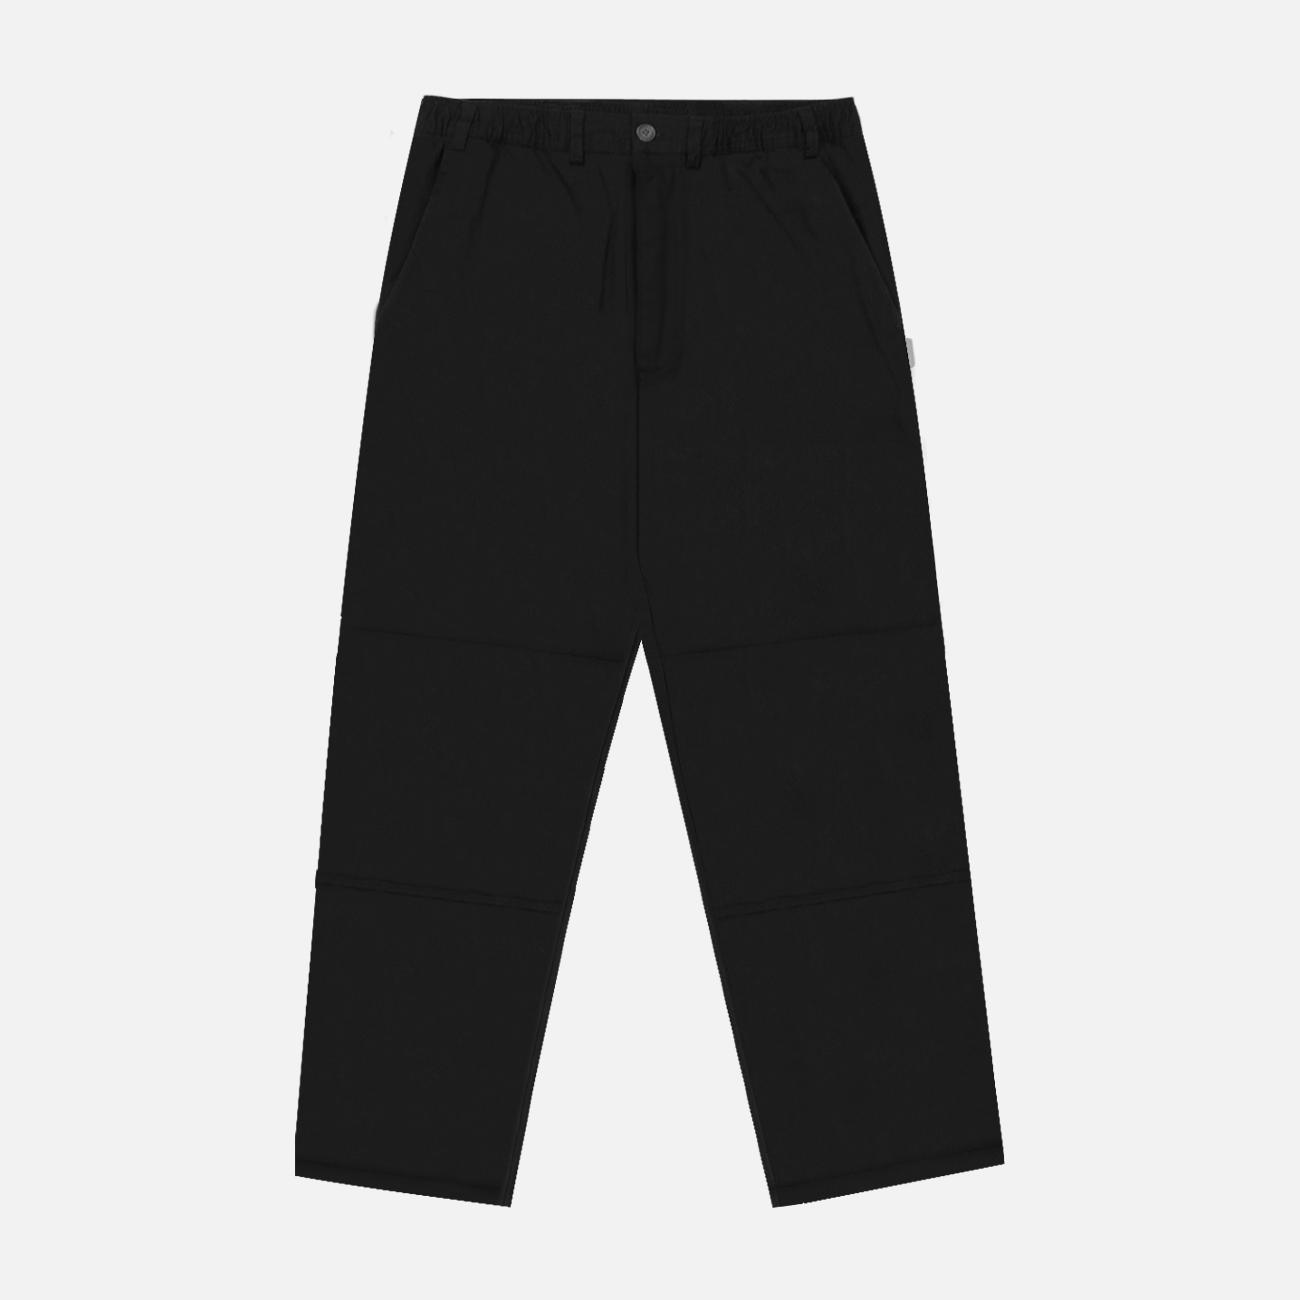 Cross Country Carpenter Pants | Black